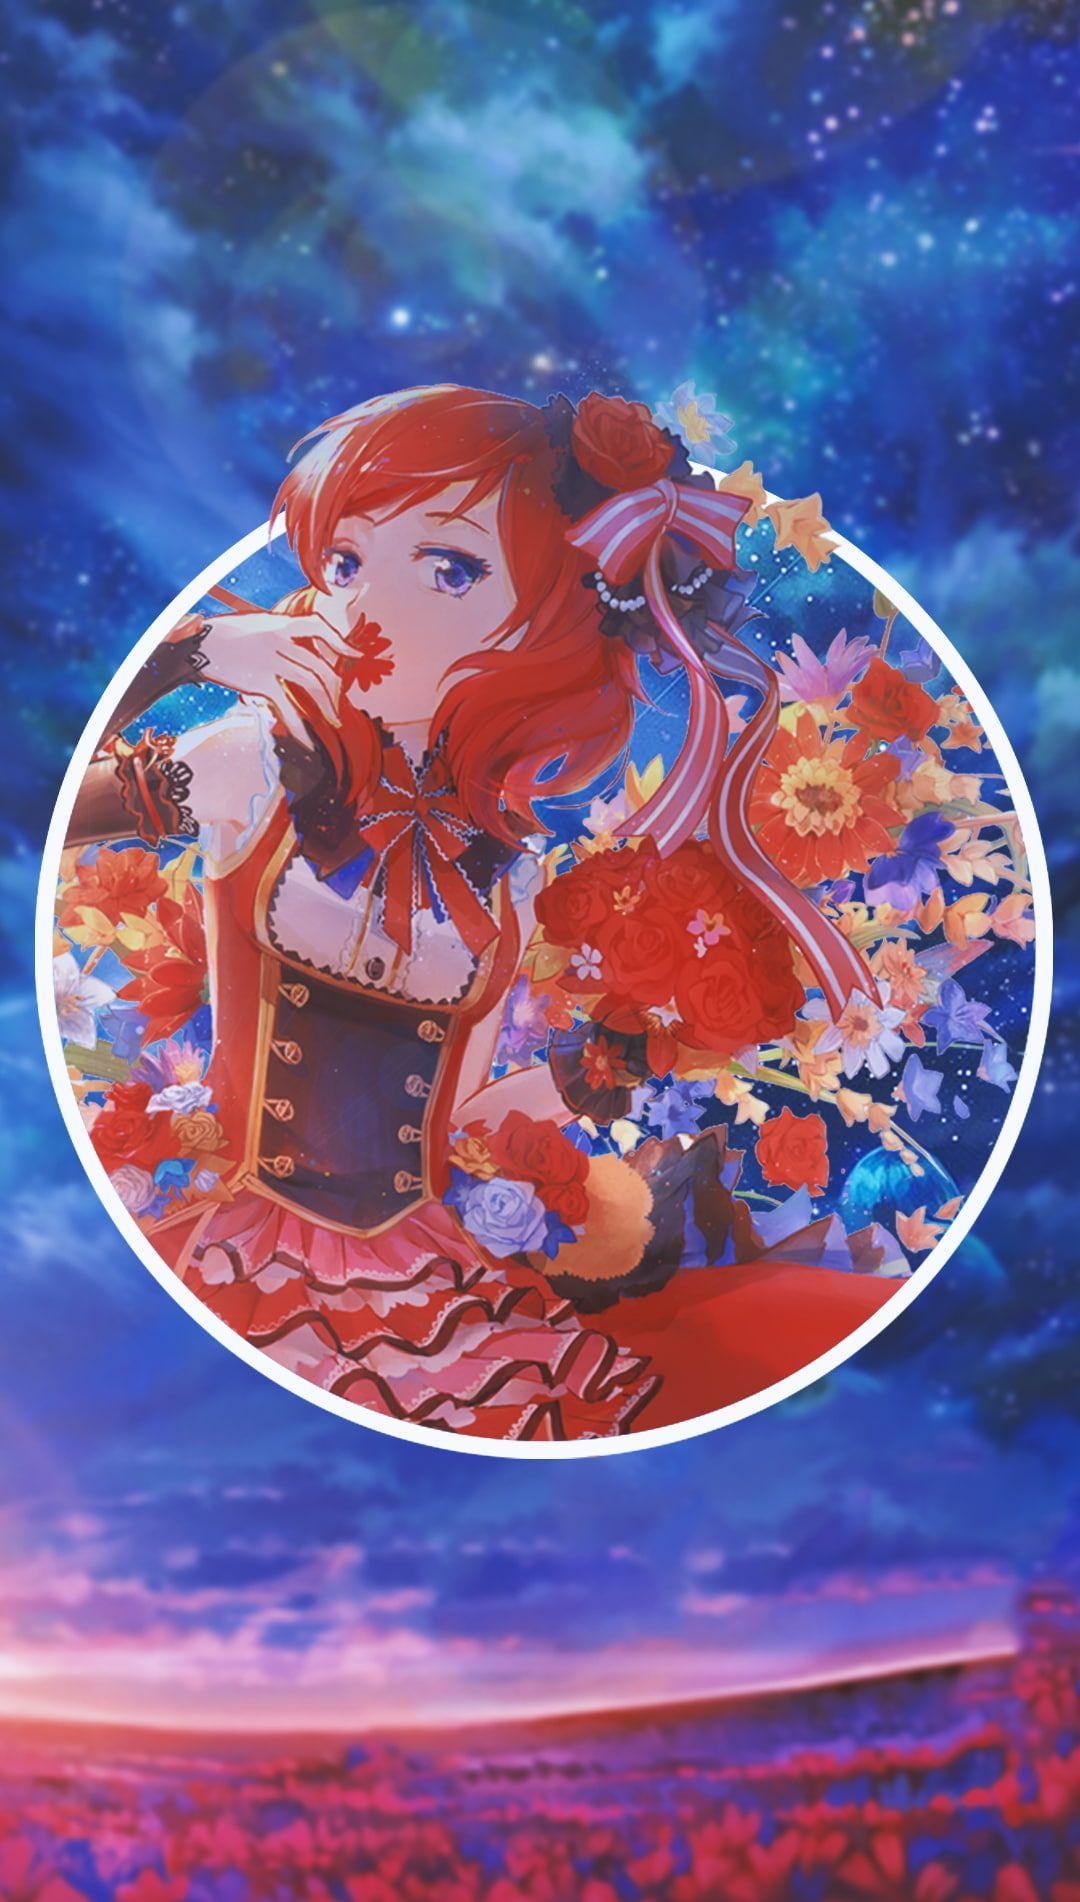 Anime Anime Girls Picture In Picture Love Live Maki Nishikino Nishikino Maki 720p Wallpaper In 2020 Anime Wallpaper Phone Hd Anime Wallpapers Anime